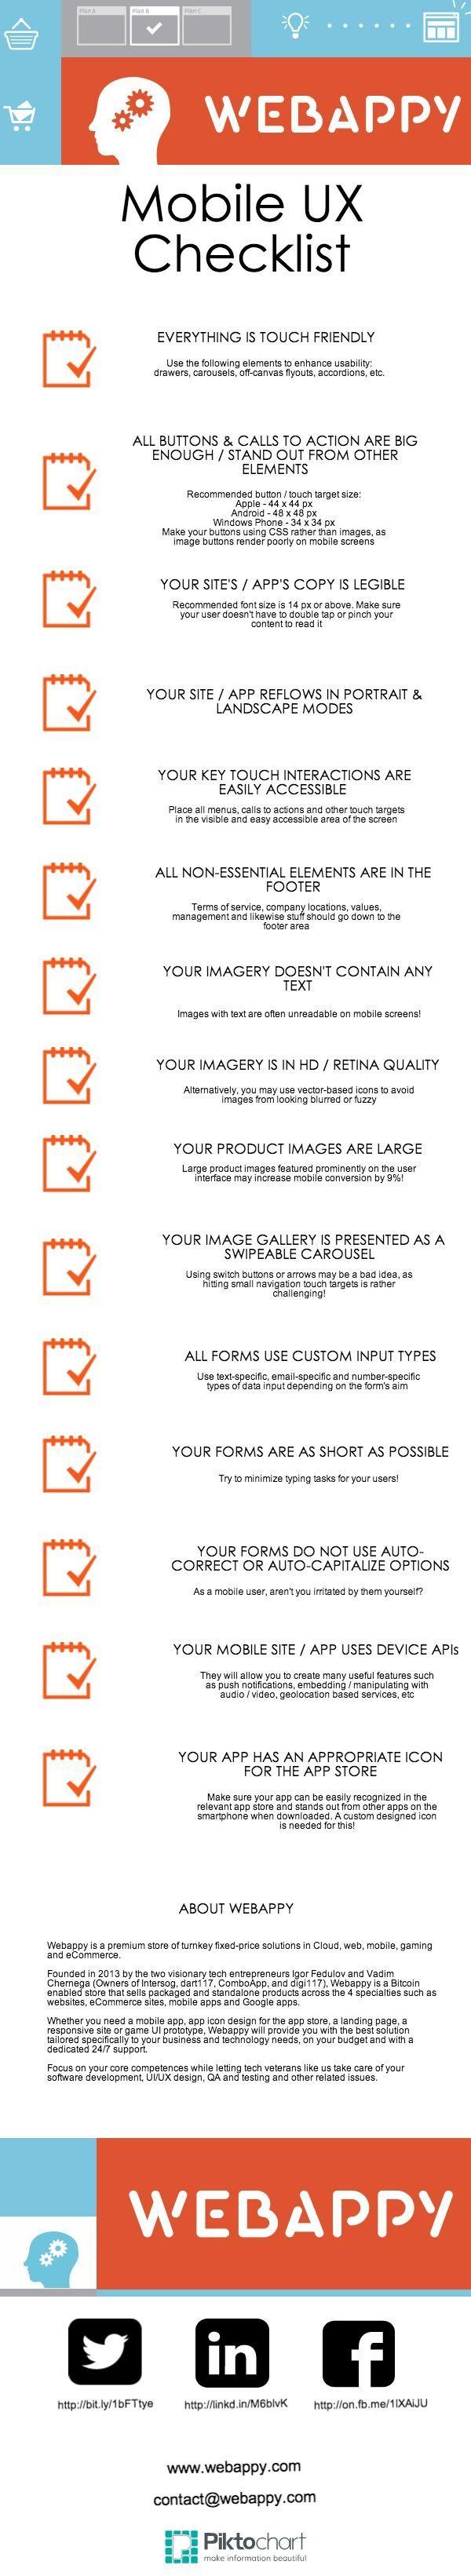 Mobile UX Checklist [Infographics] -- [Mobile Development] [Mobile Design] [App Design] [UX] #DigitalE45DK #BizzAppsDK #HyperSynectics